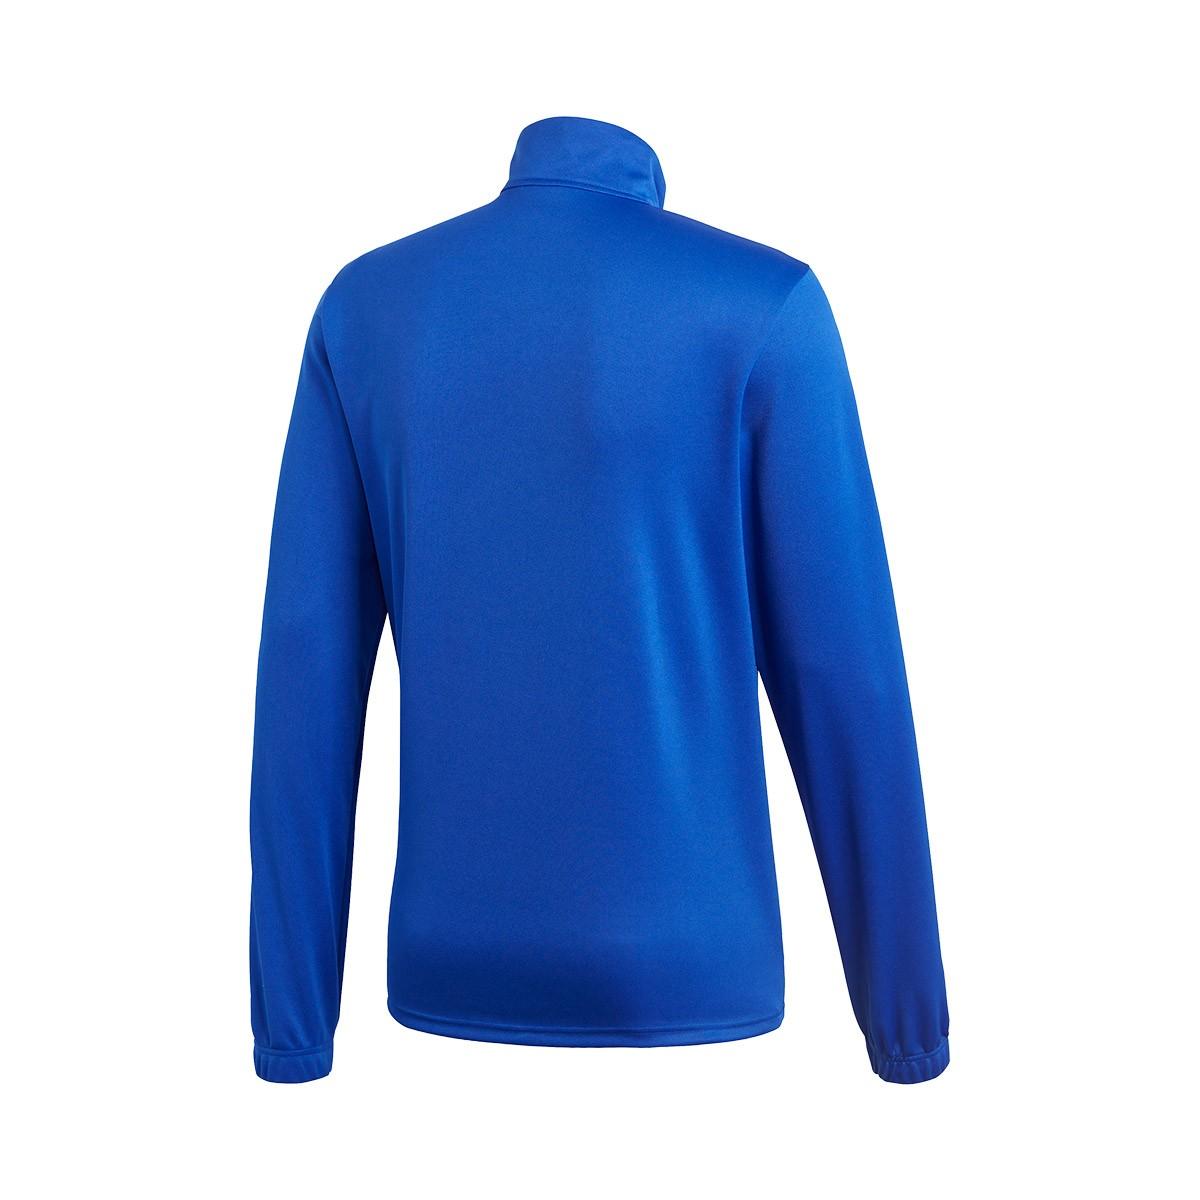 f59cc8908 Sweatshirt adidas Core 18 Training Bold blue-White - Football store ...